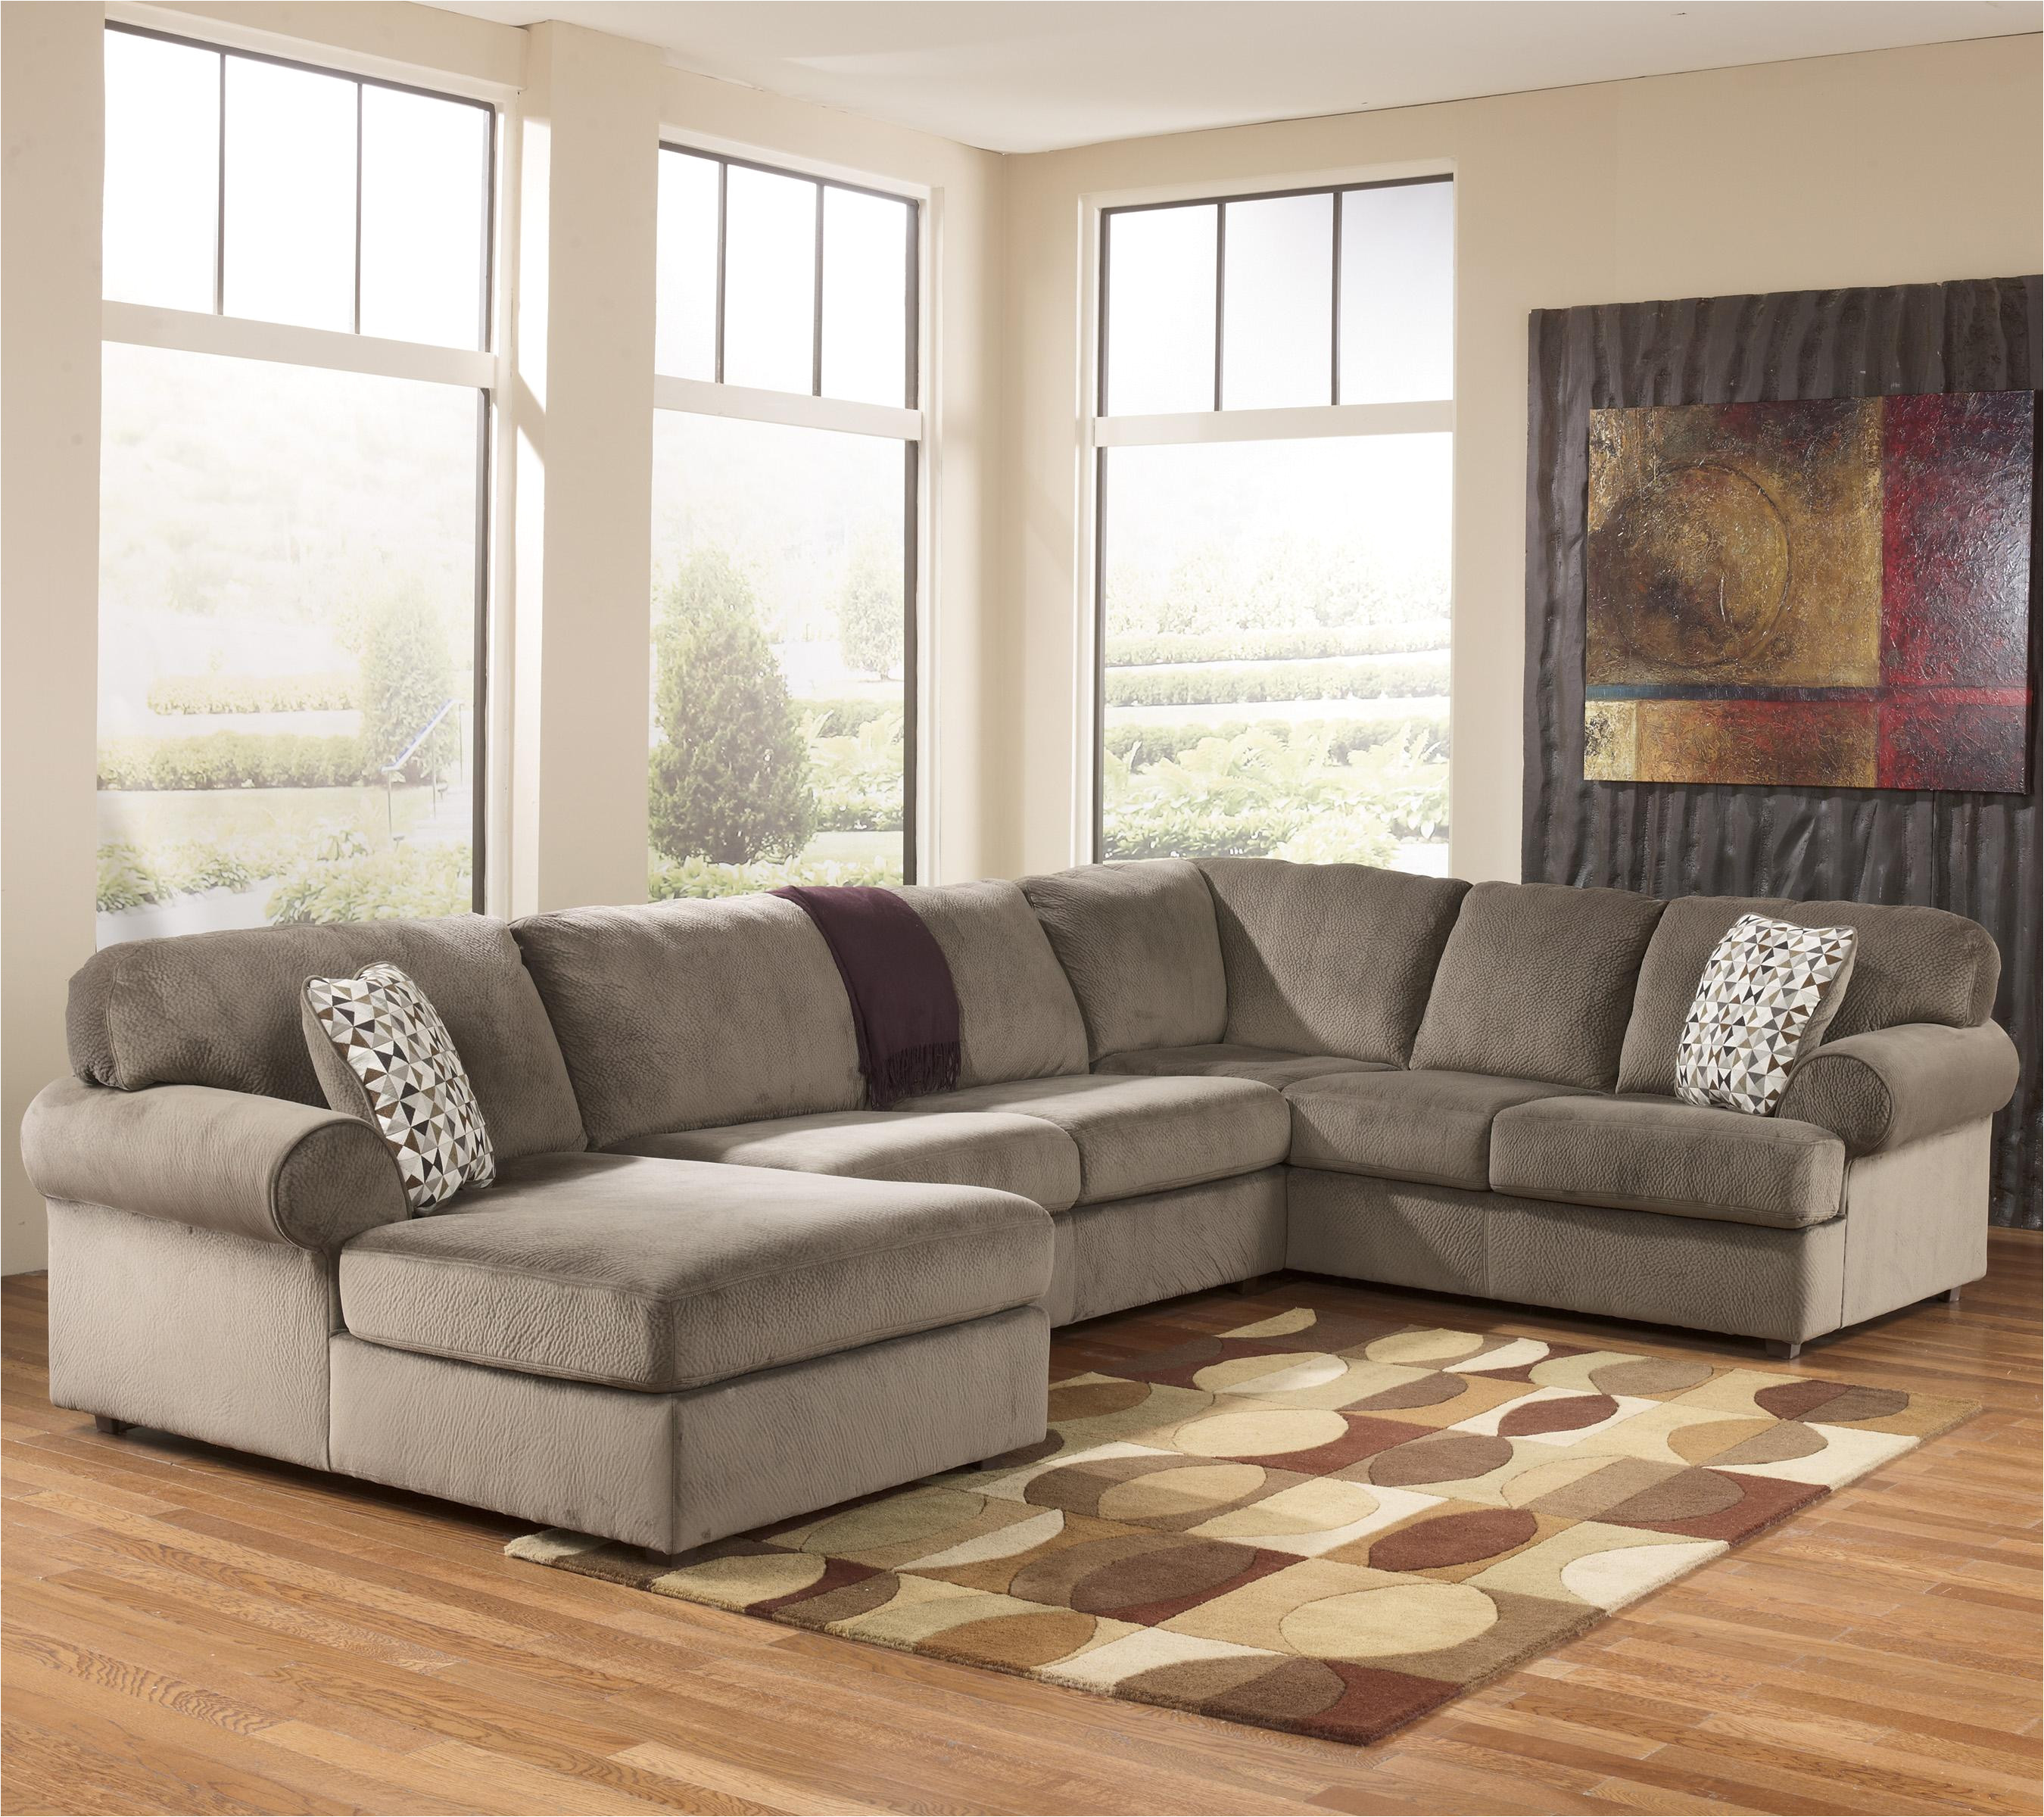 furniture stores in jonesboro ar furniture stores in bentonville arkansas furniture hot springs ar